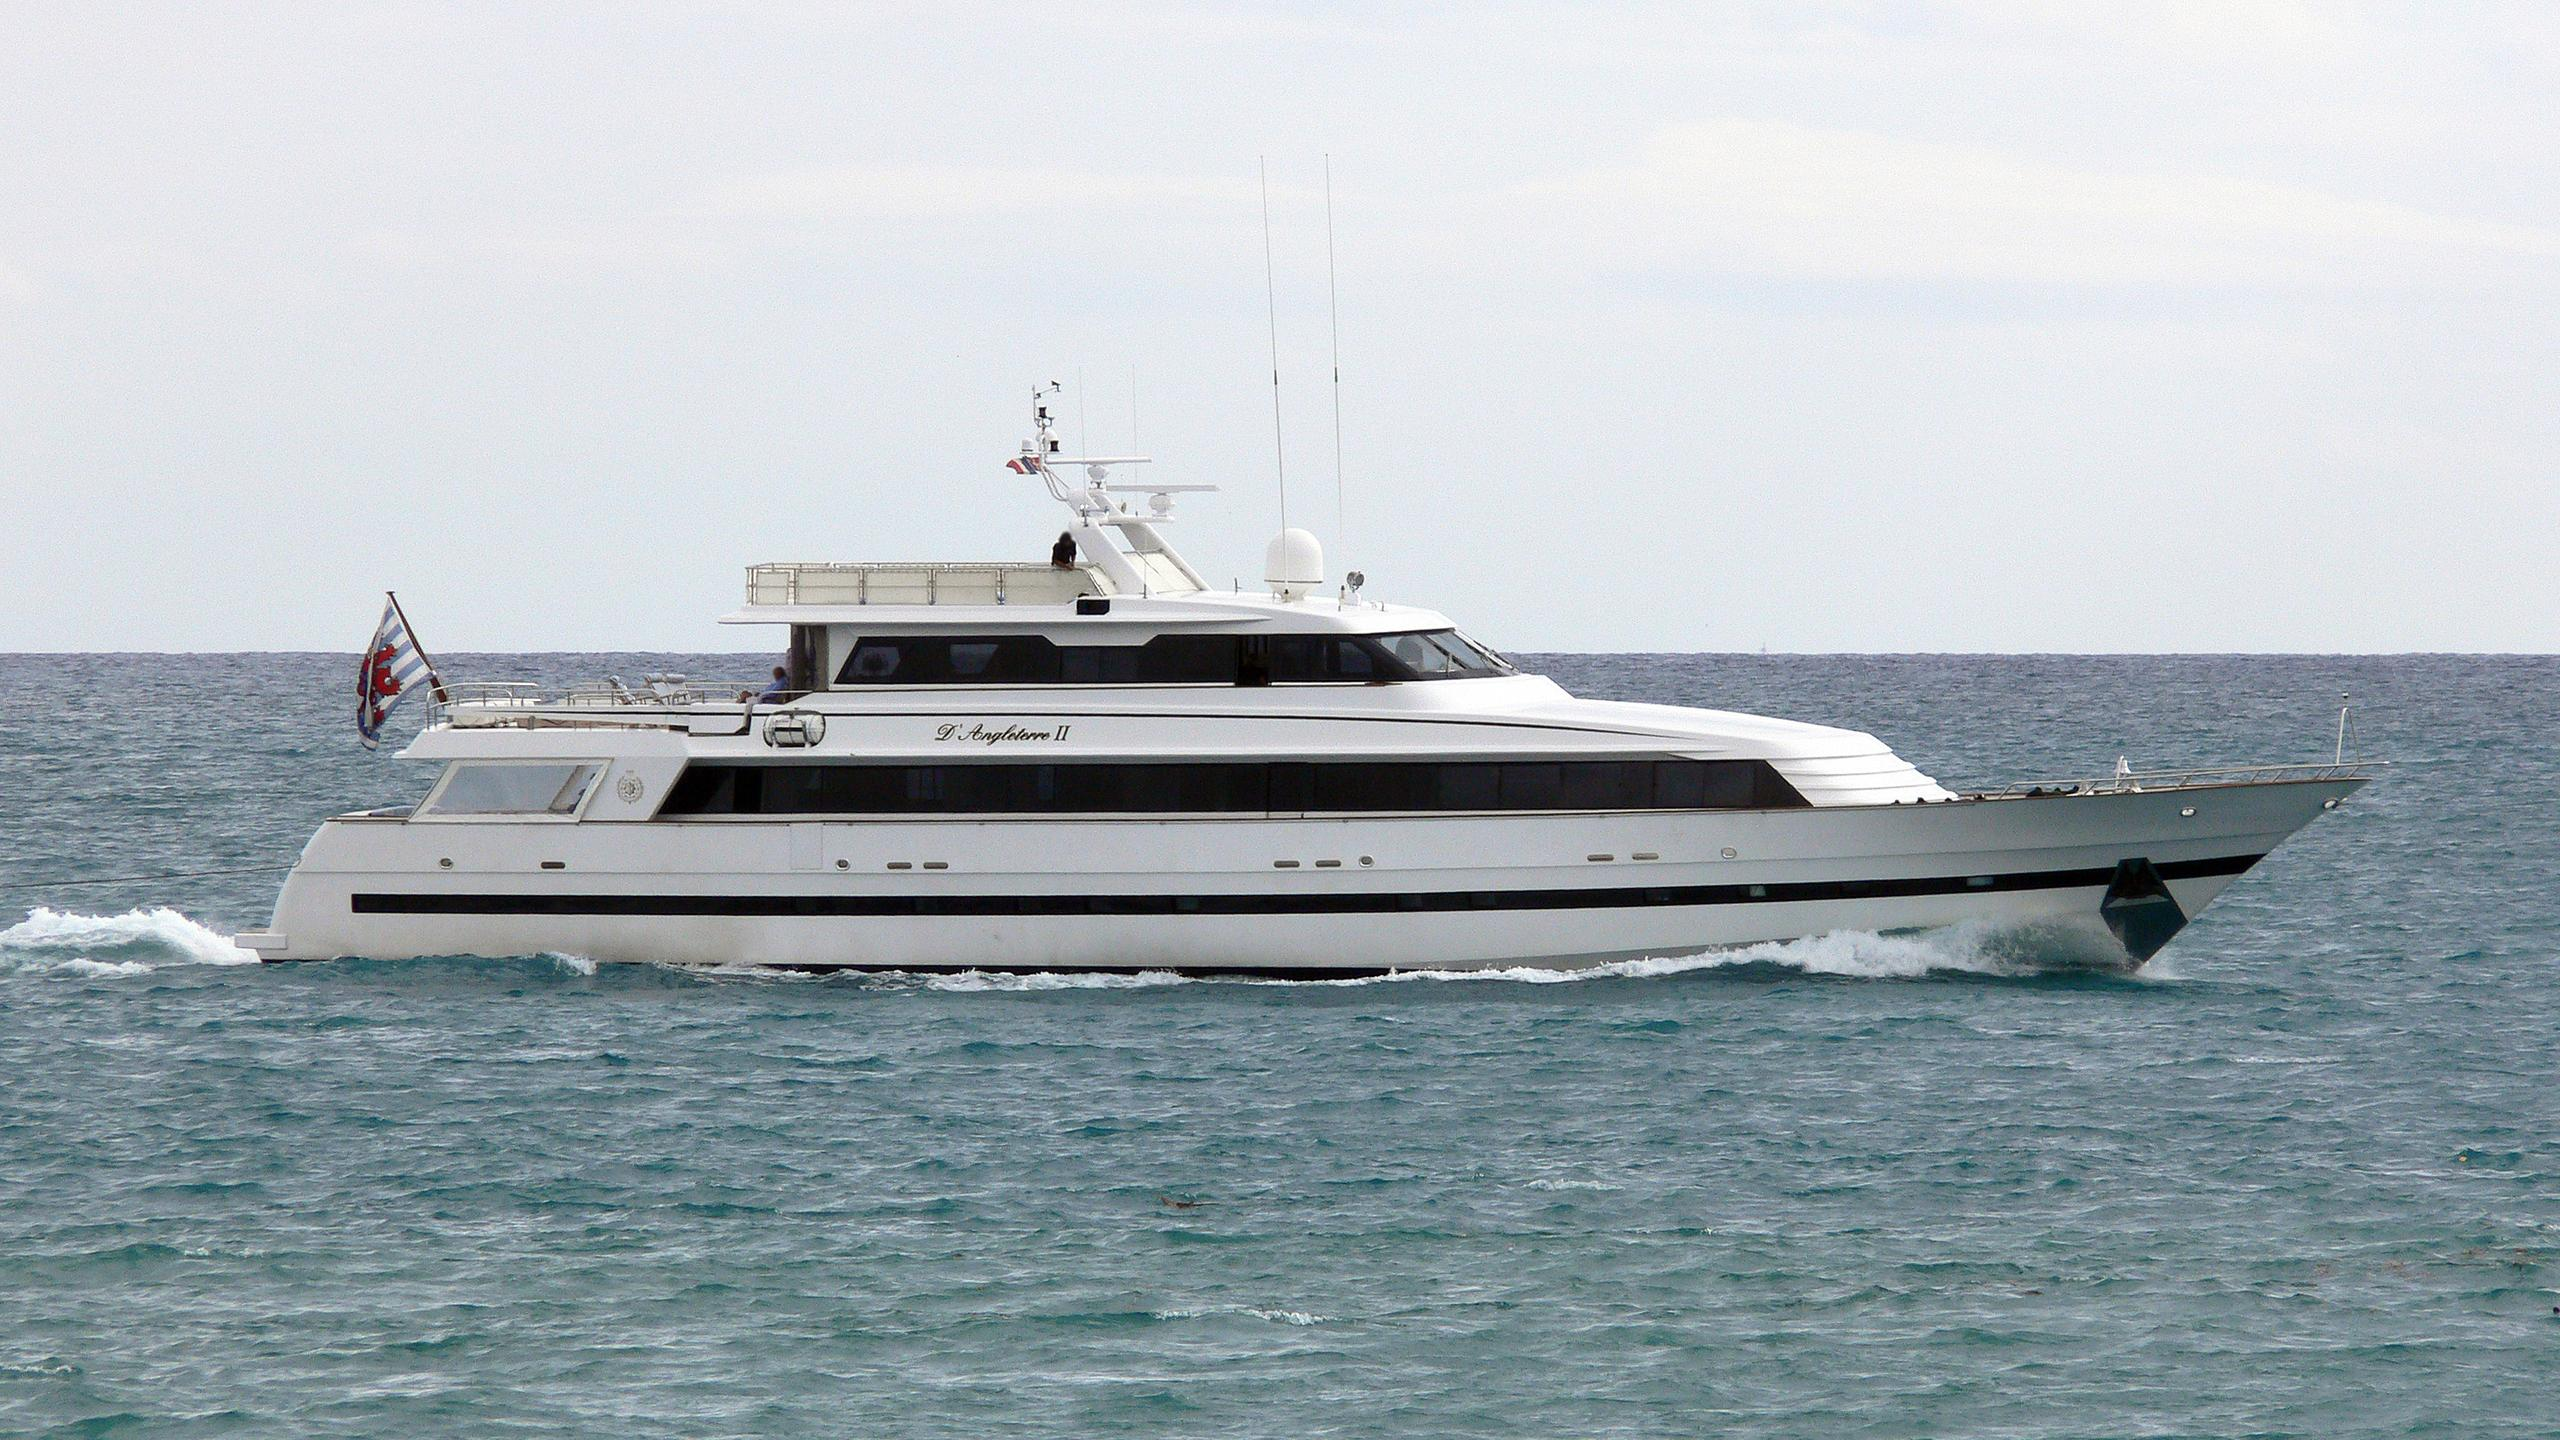 d-angleterre-ii-de-copenhague-motor-yacht-w-a-souter-son-1986-42m-profile